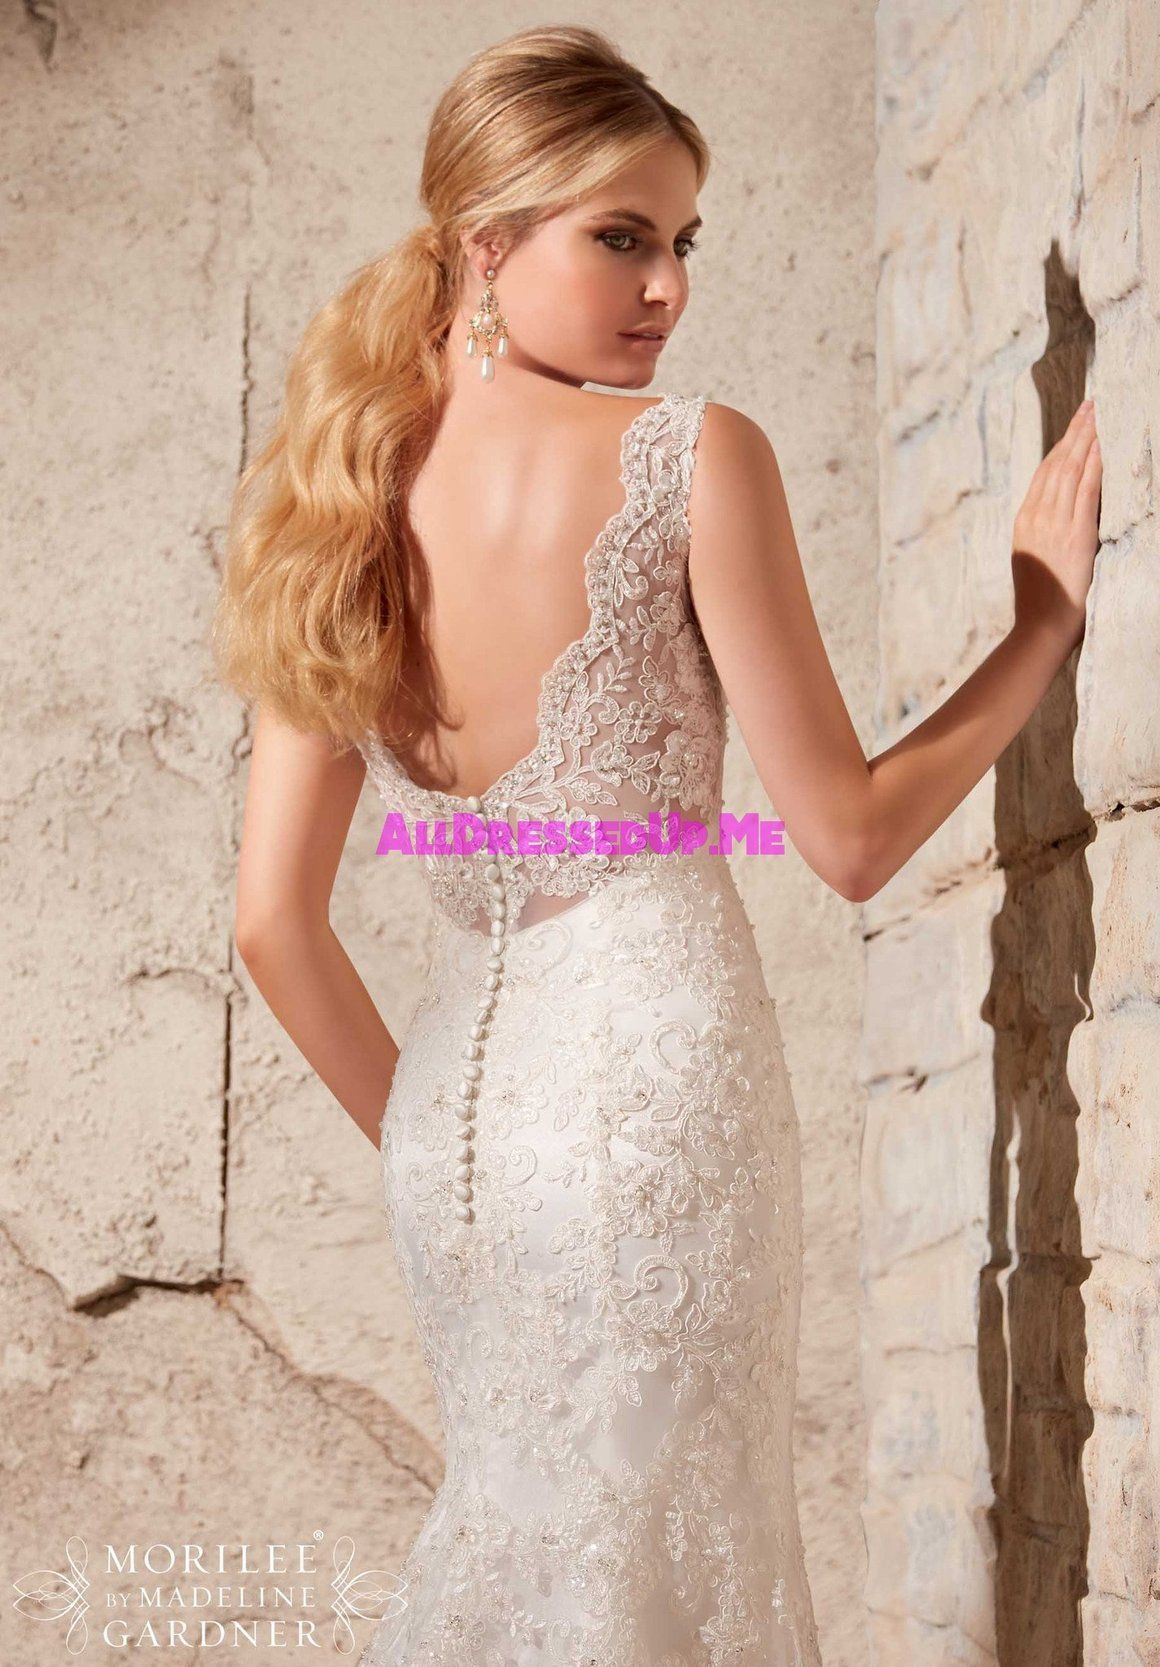 Morilee all dressed up bridal gown vestido de noiva